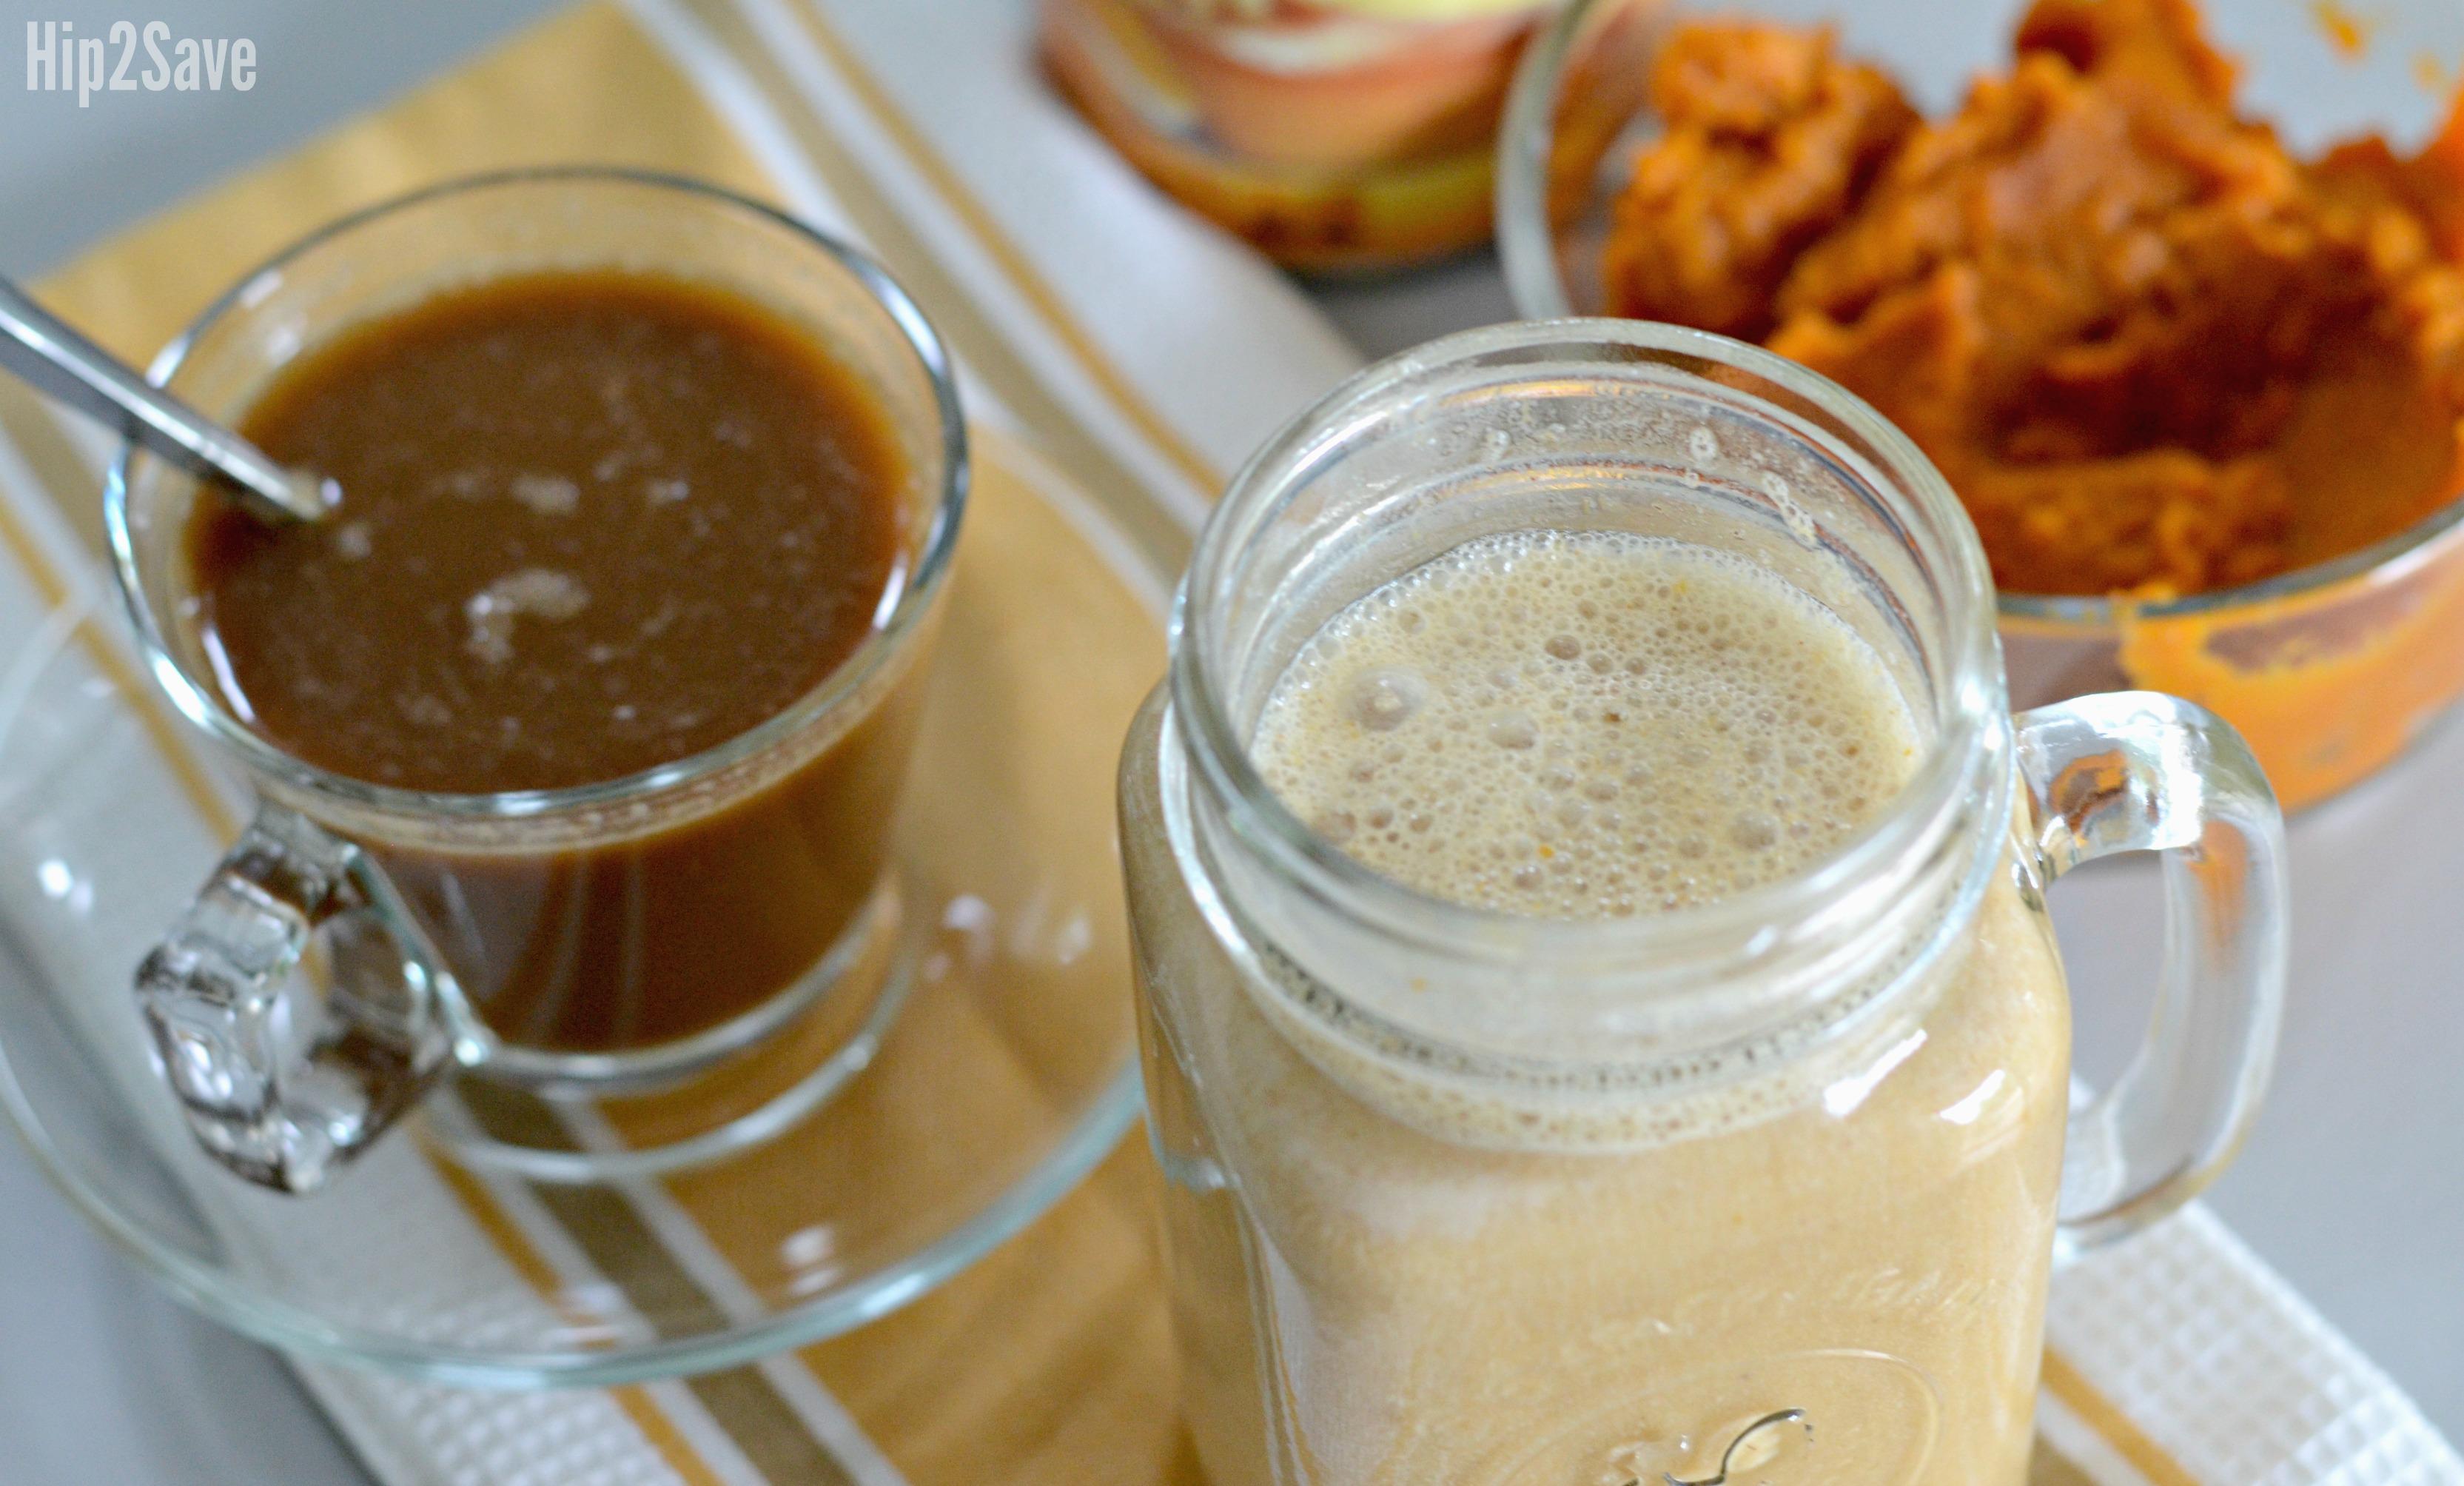 almond-milk-pumpkin-spice-creamer-hip2save-com